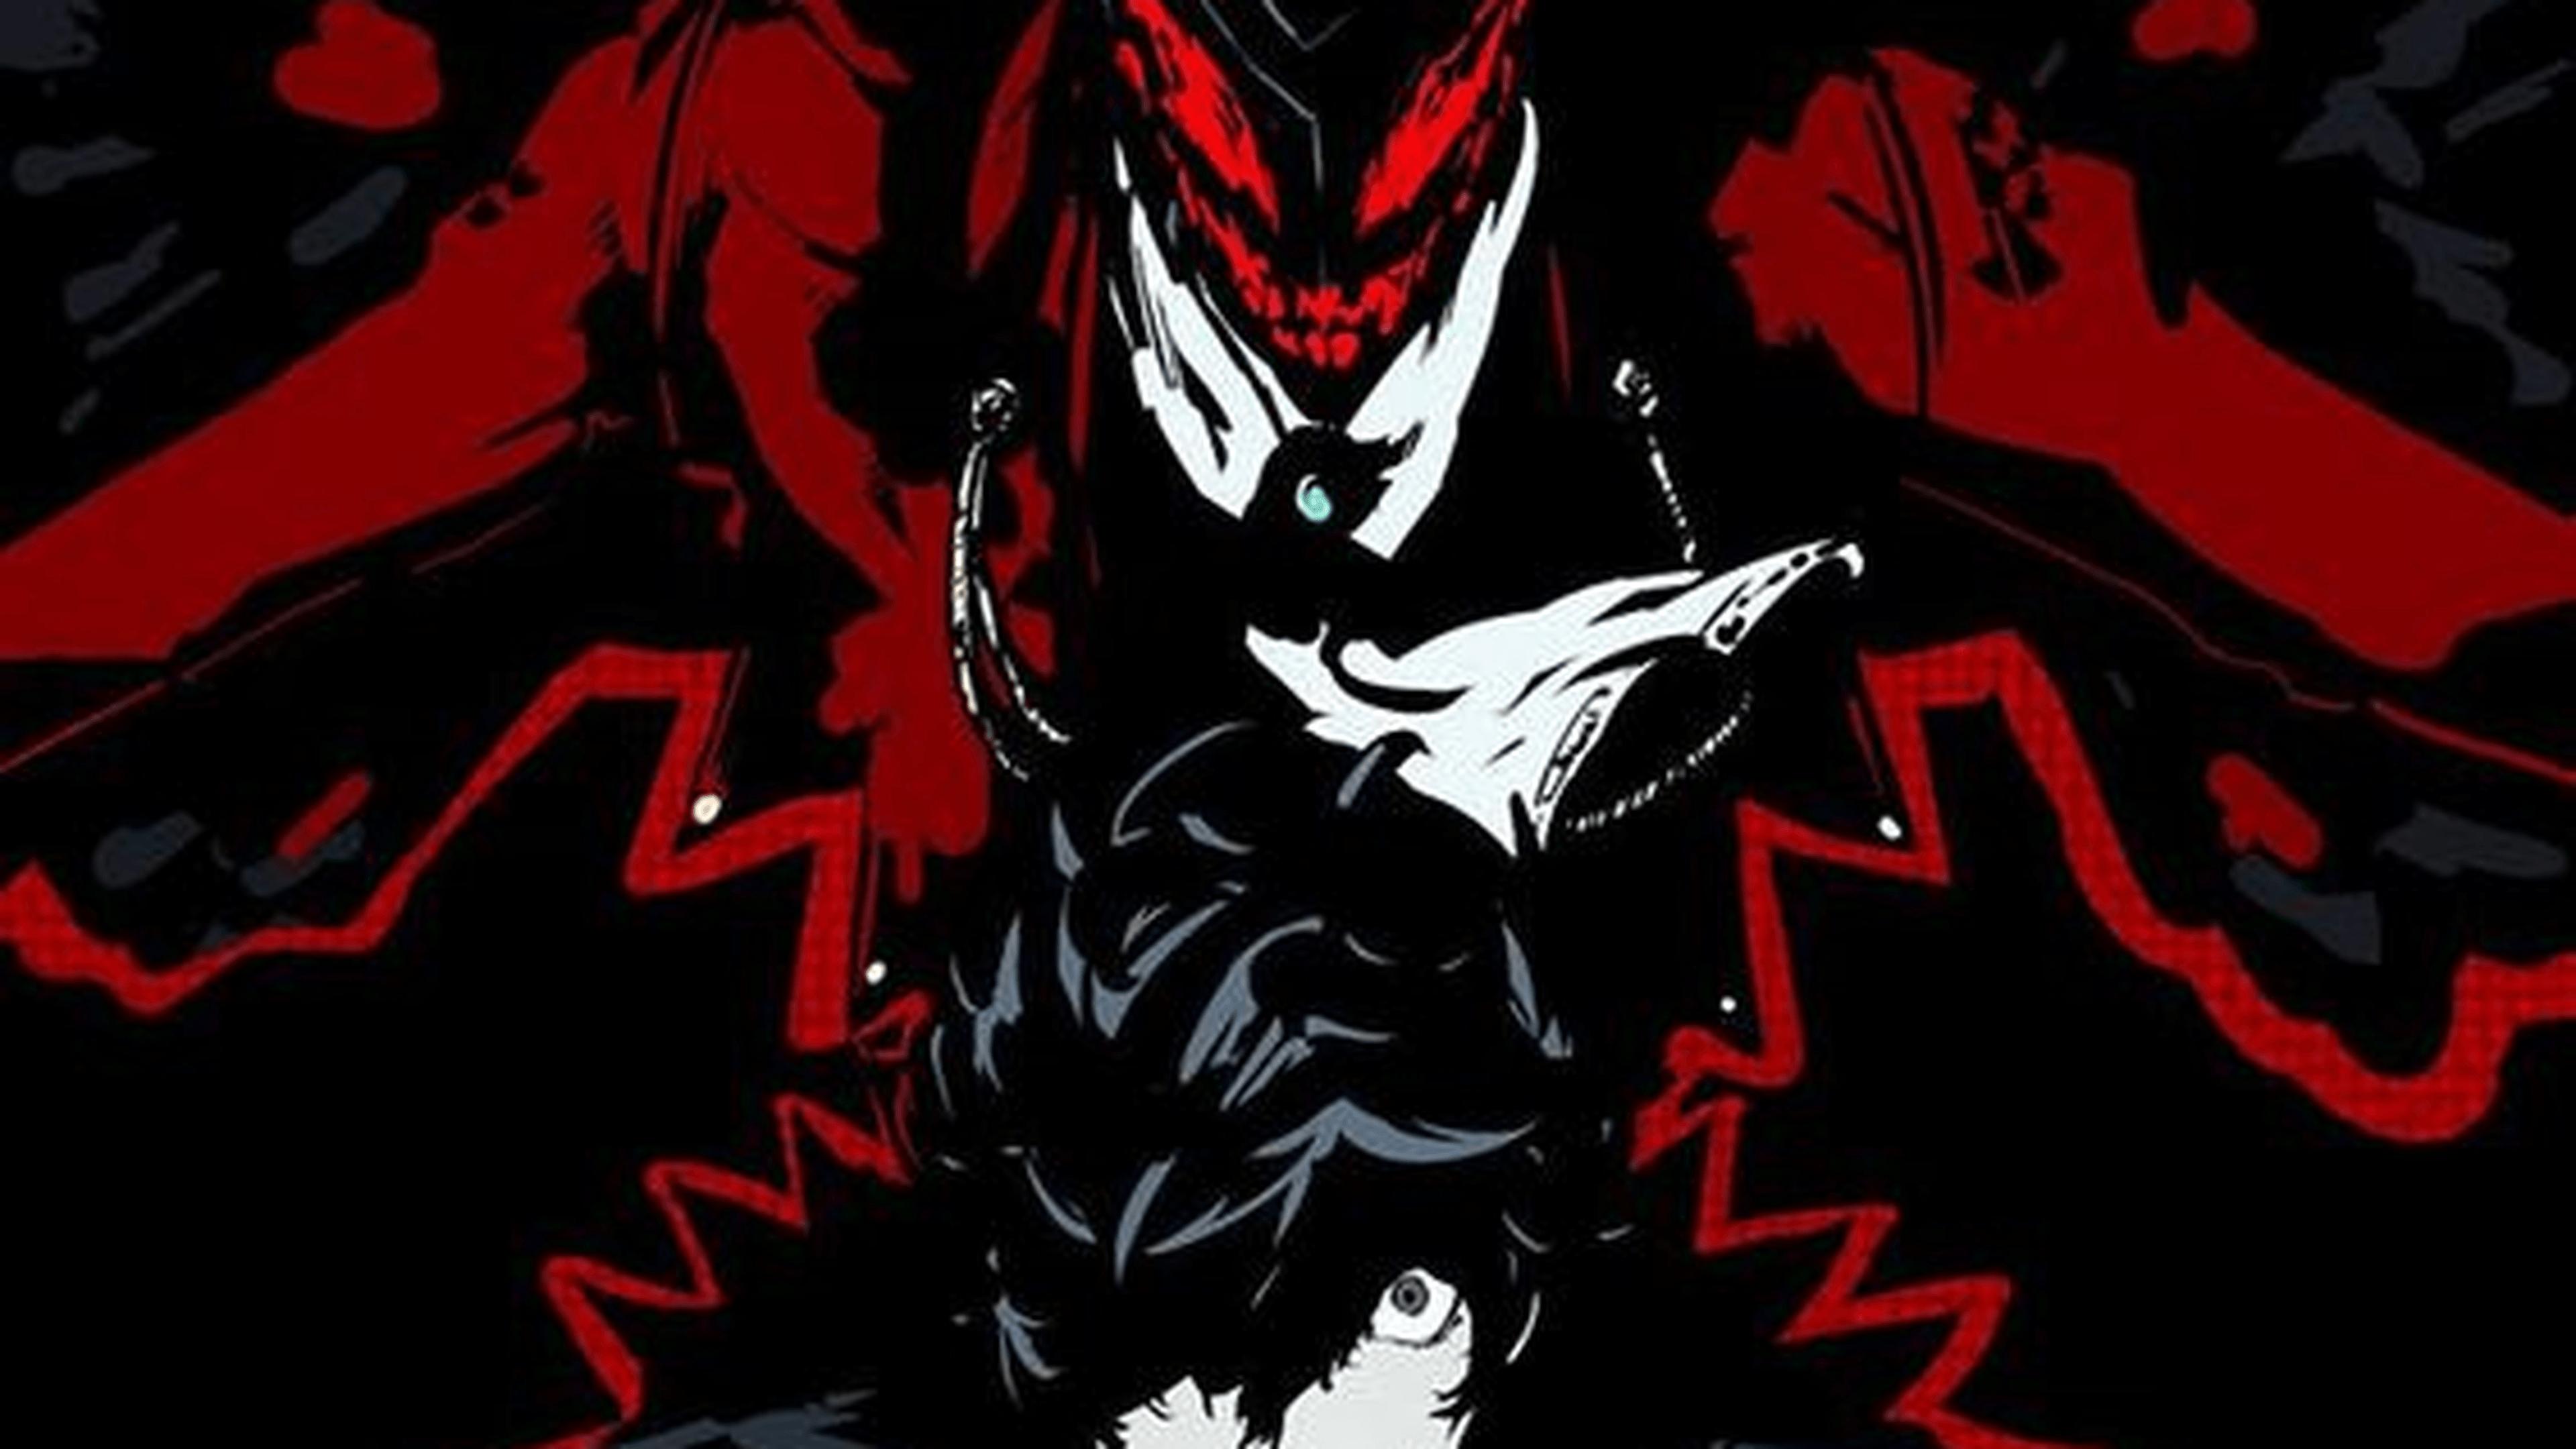 Minimalist Persona Joker Wallpapers - Wallpaper Cave